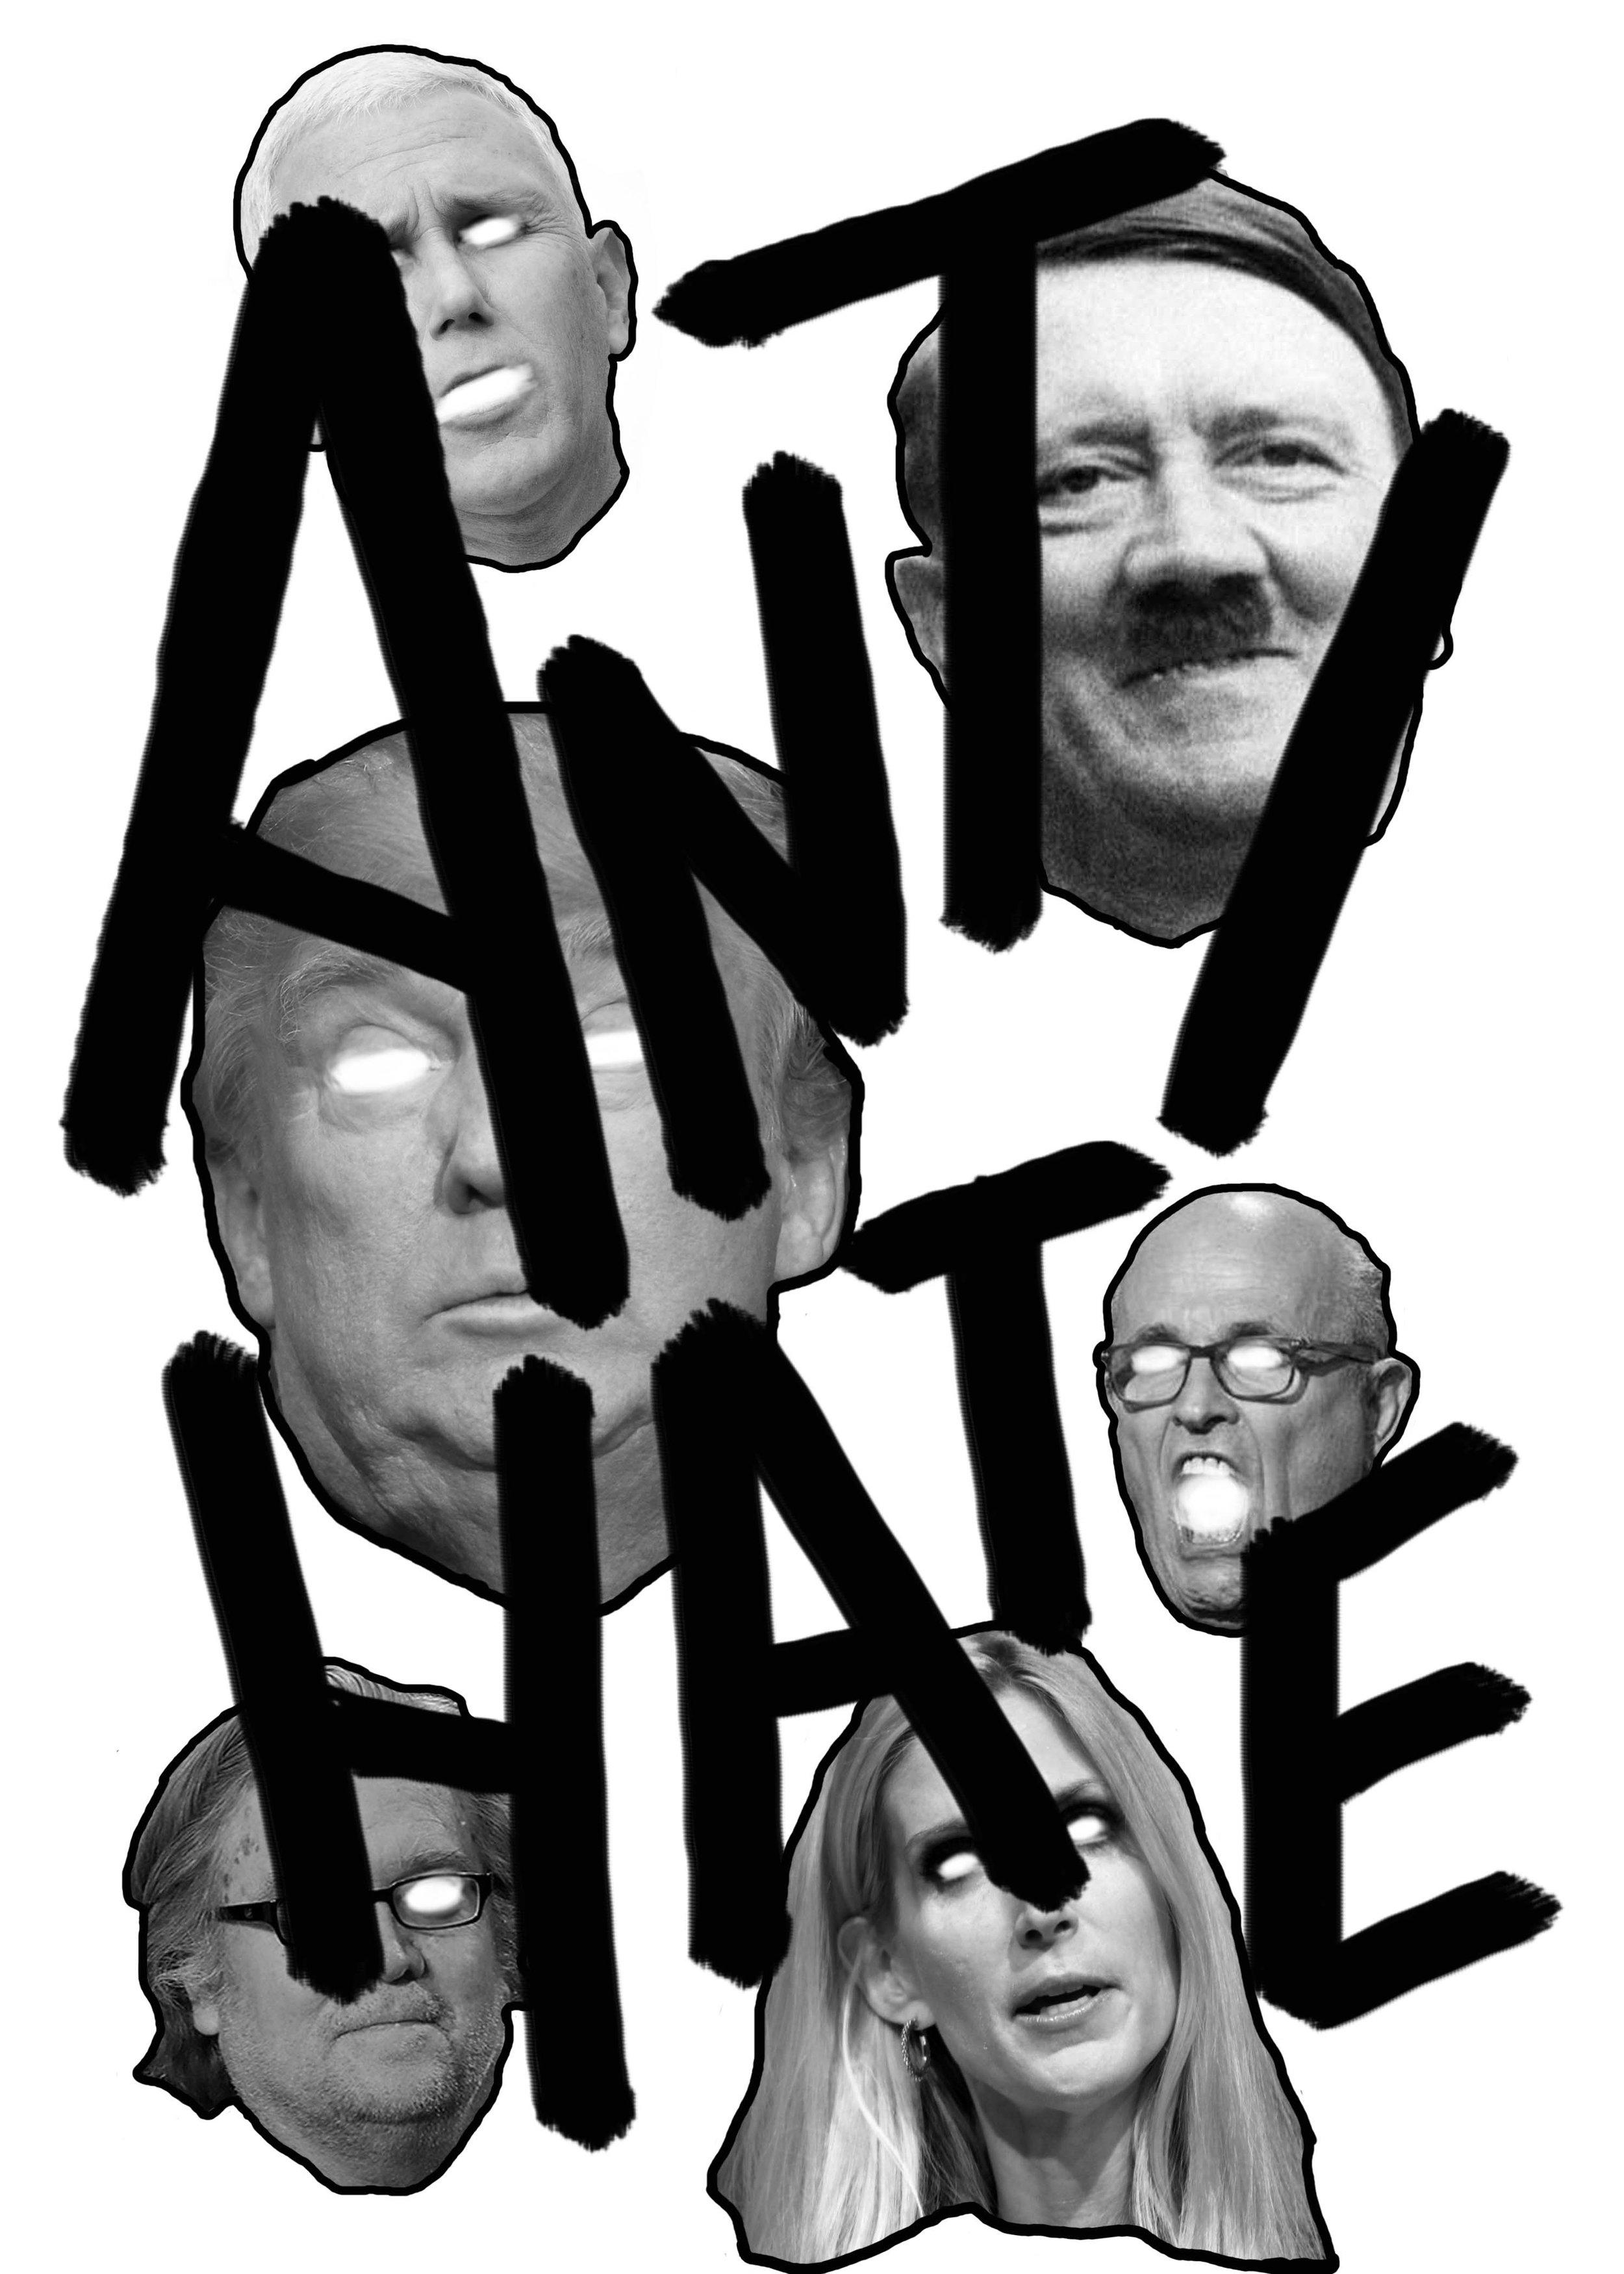 antihatefrontcover.jpg